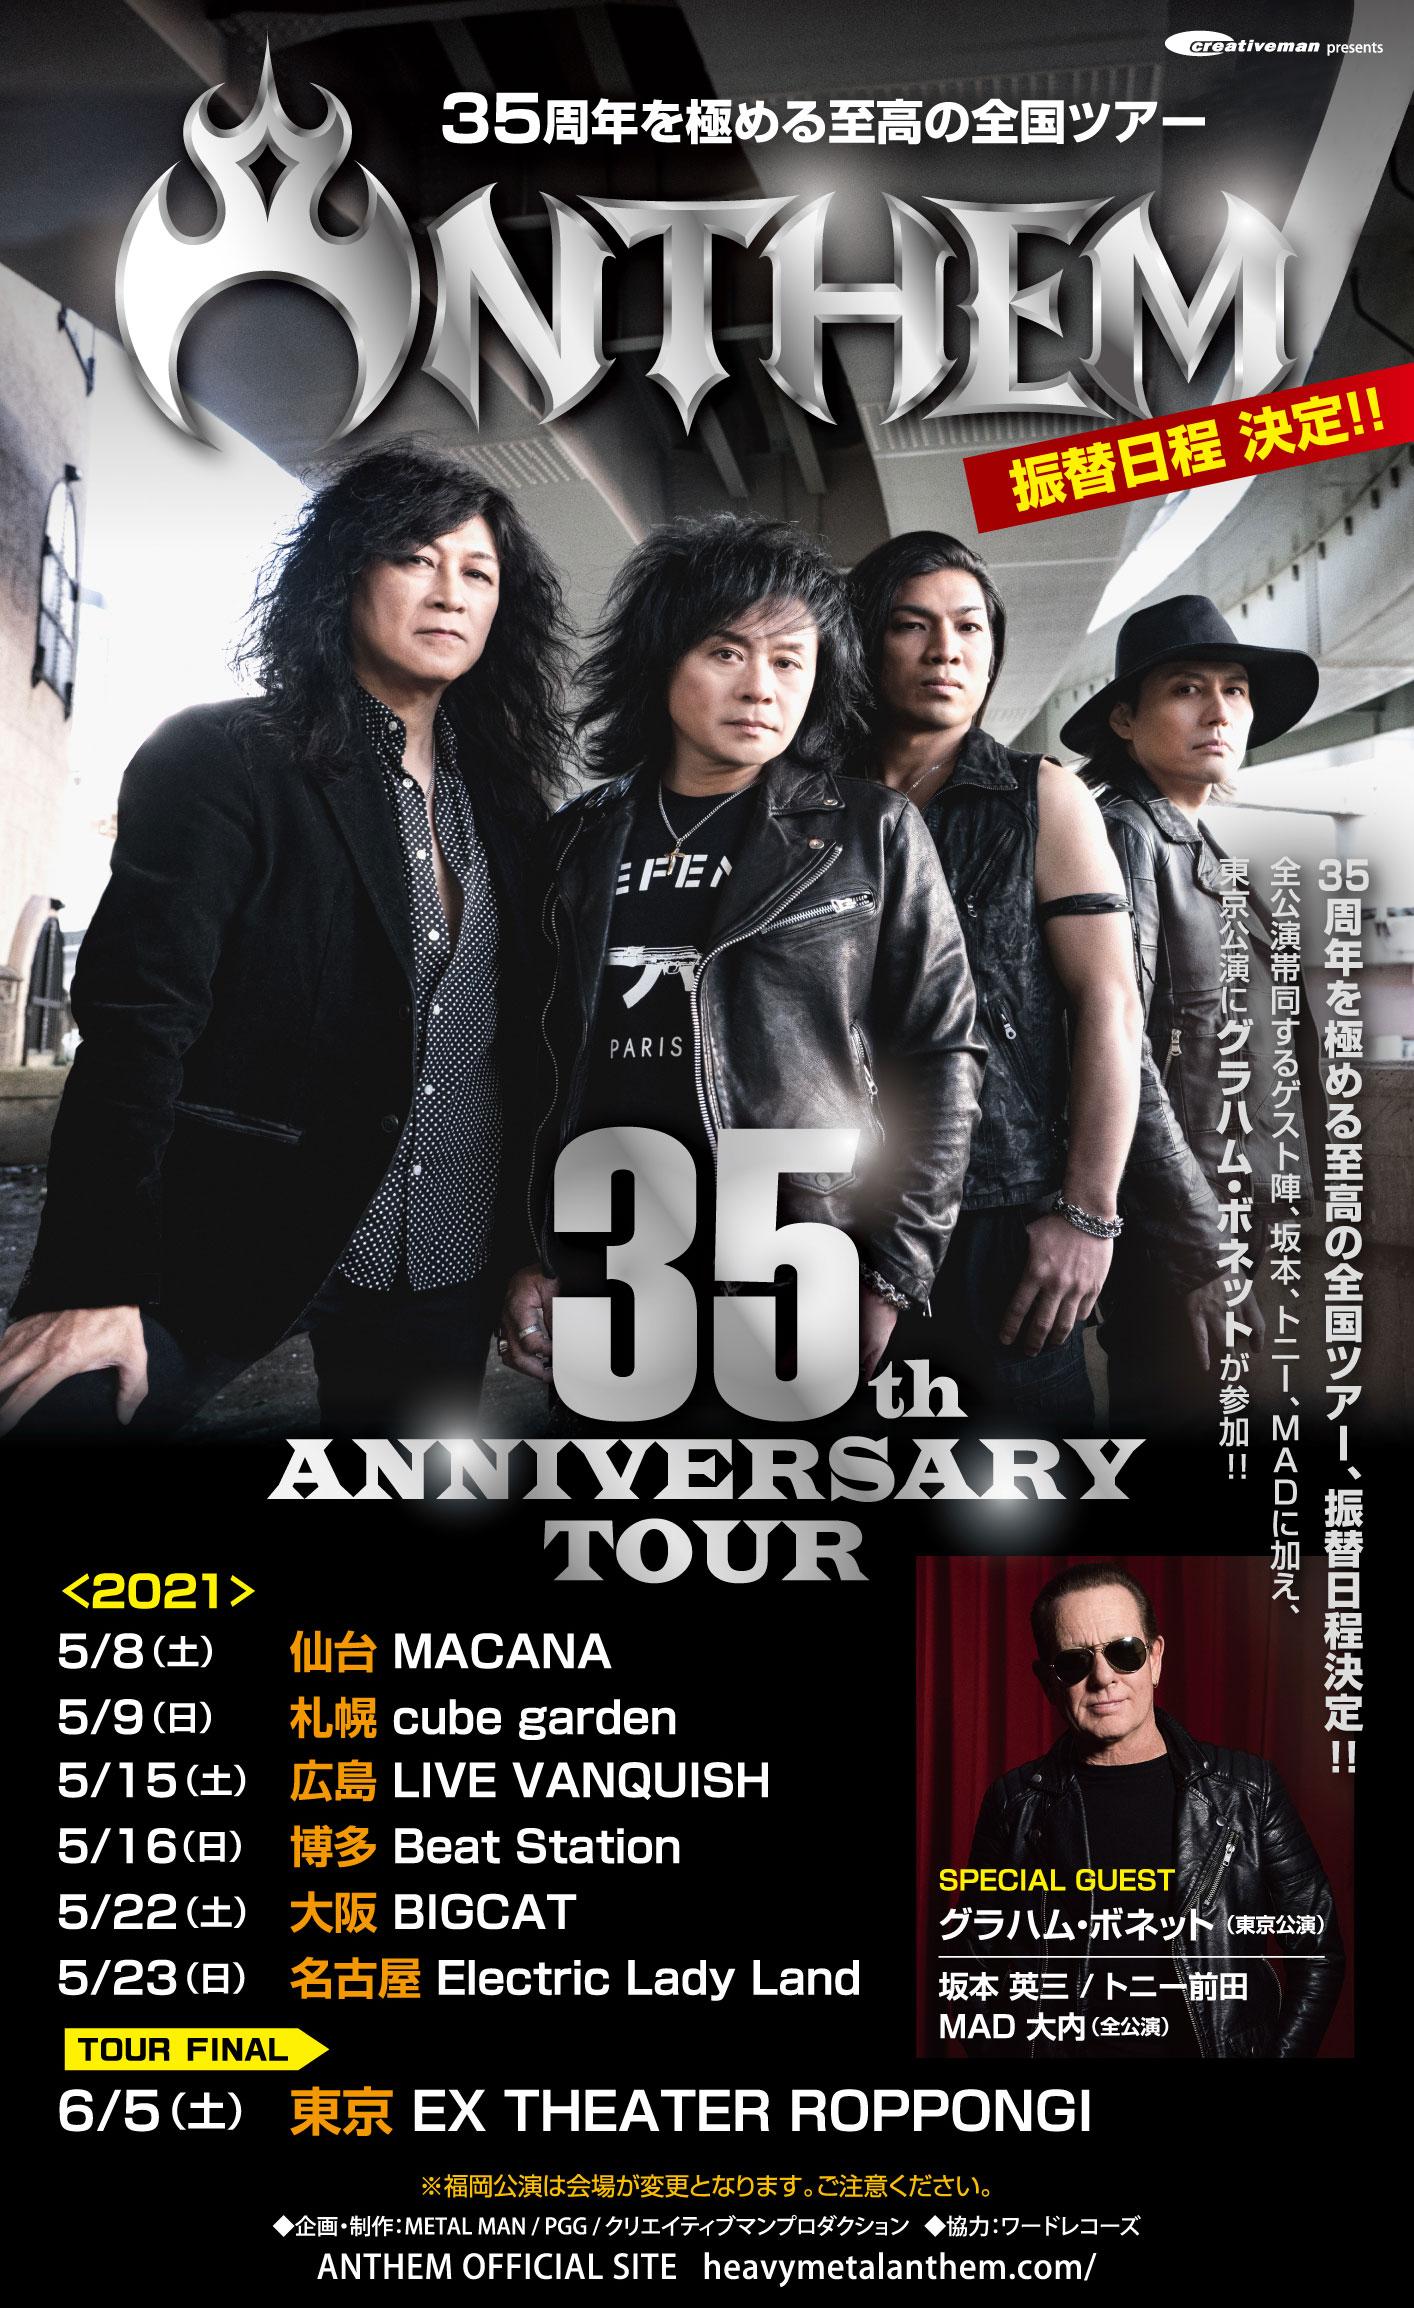 【公演延期】ANTHEM 35th ANNIVERSARY TOUR -TOUR FINAL-  [東京]